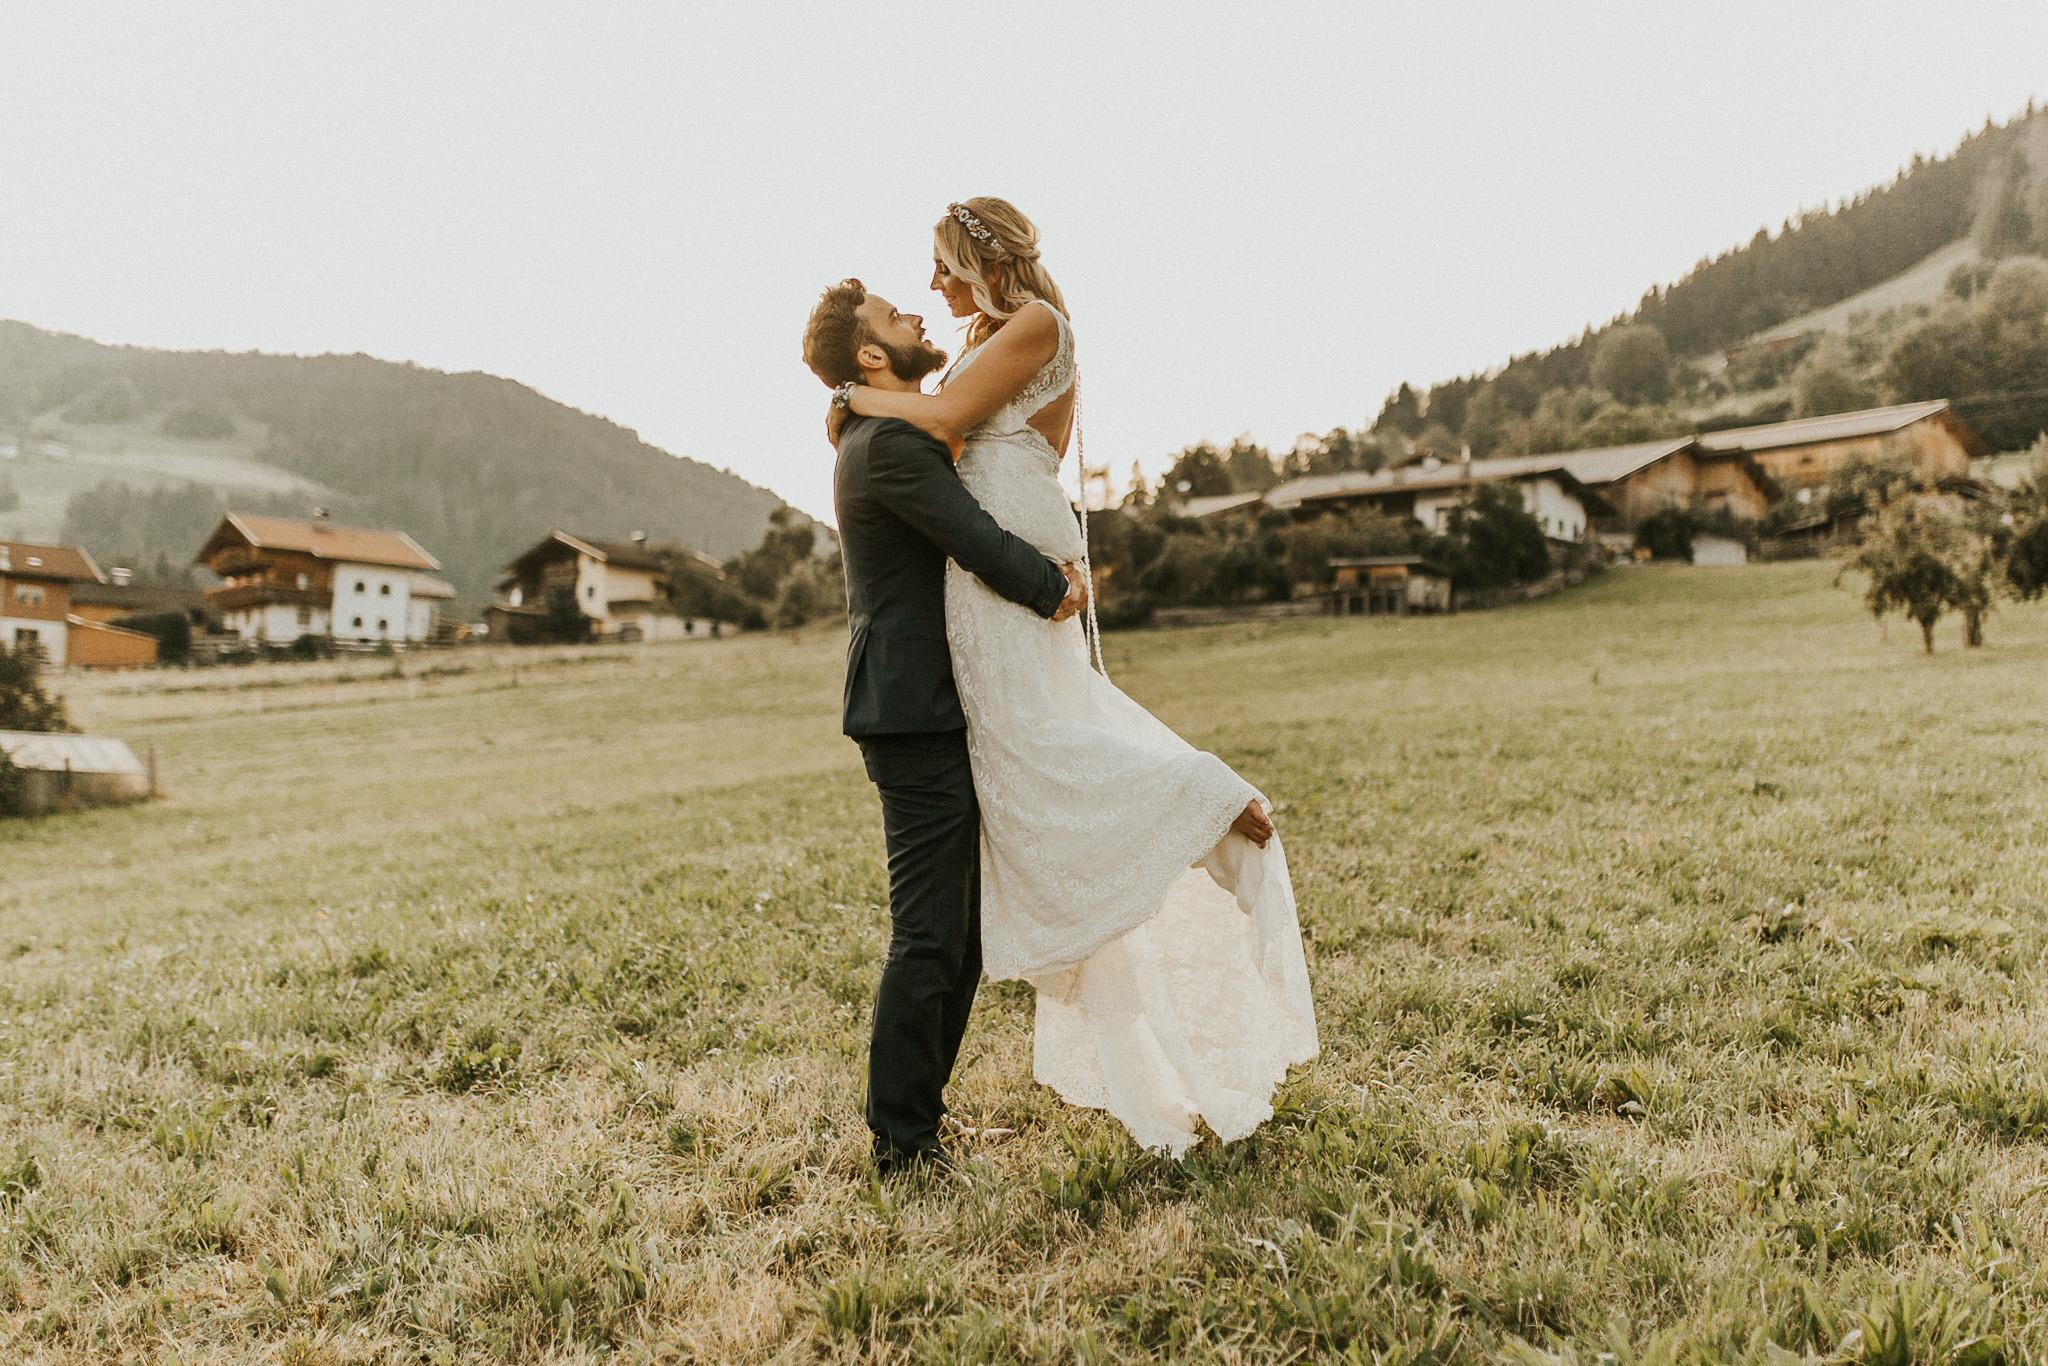 Intimate wedding photos in Tyrol